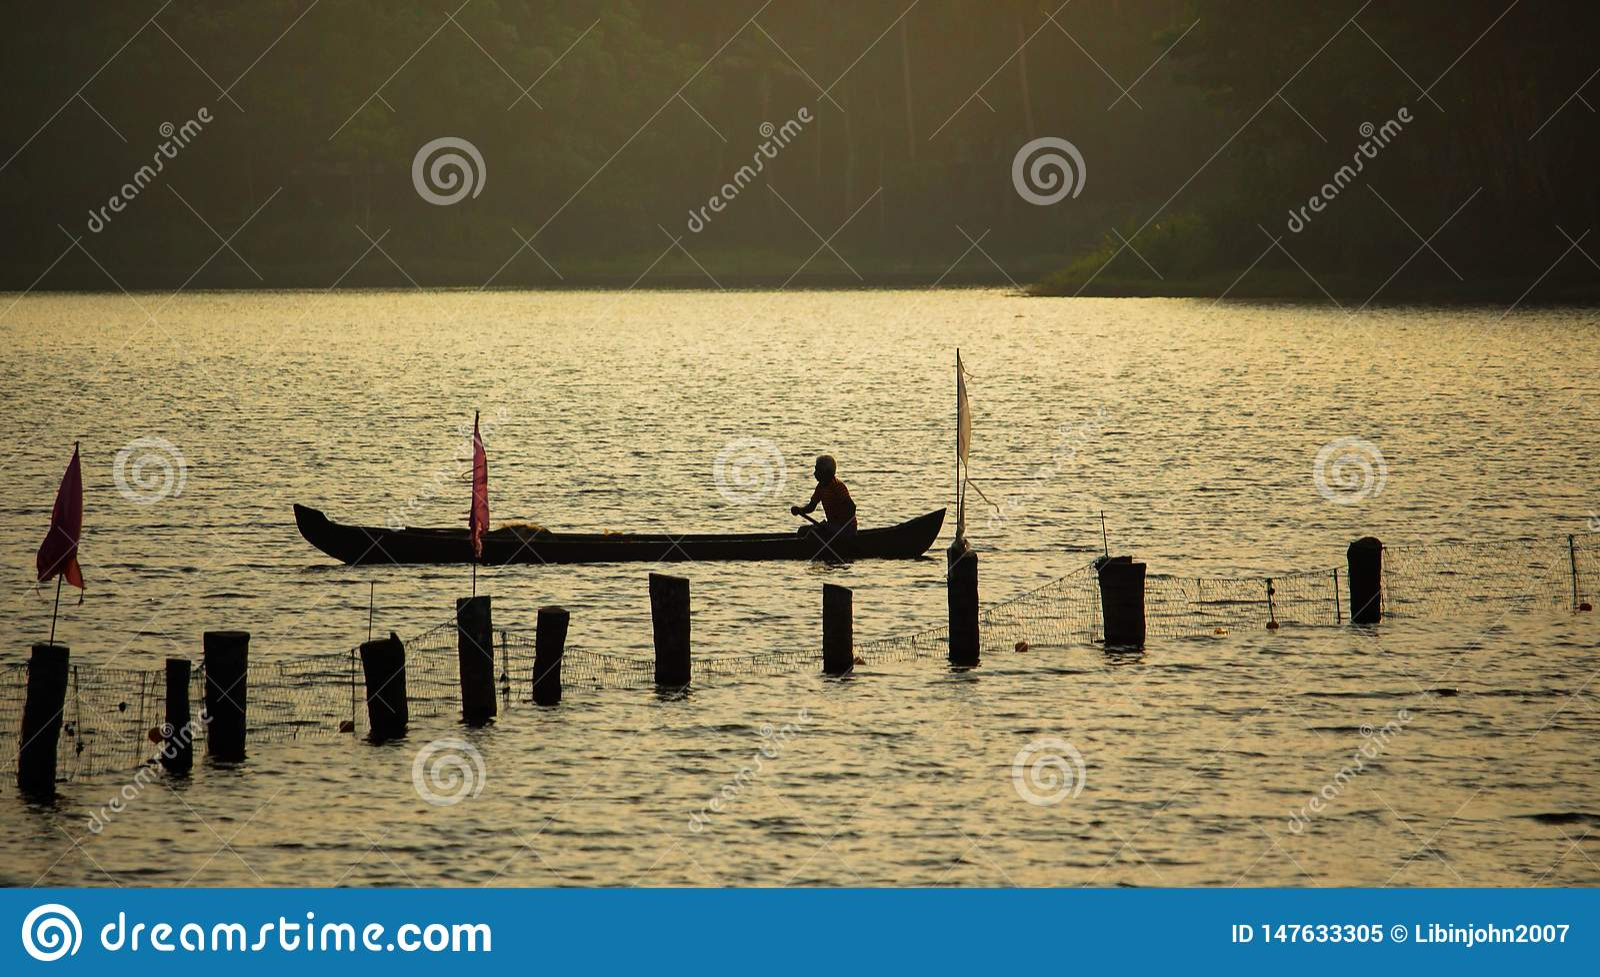 Silueta del viejo hombre solamente en barco